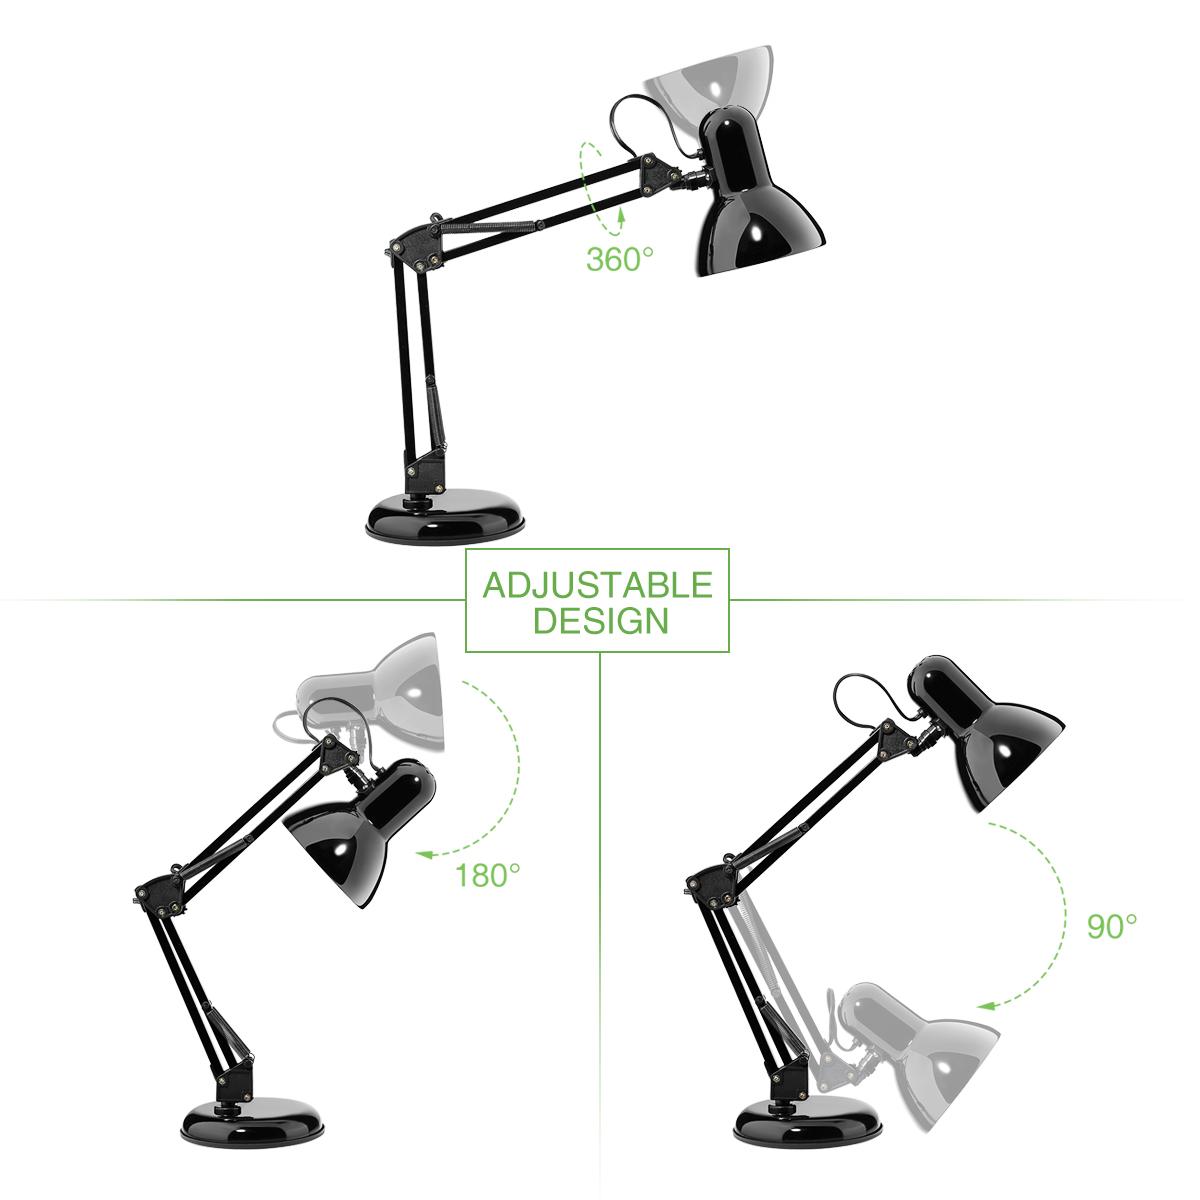 Swing Arm Desk Lamp C Clamp Table Lamp Flexible Arm